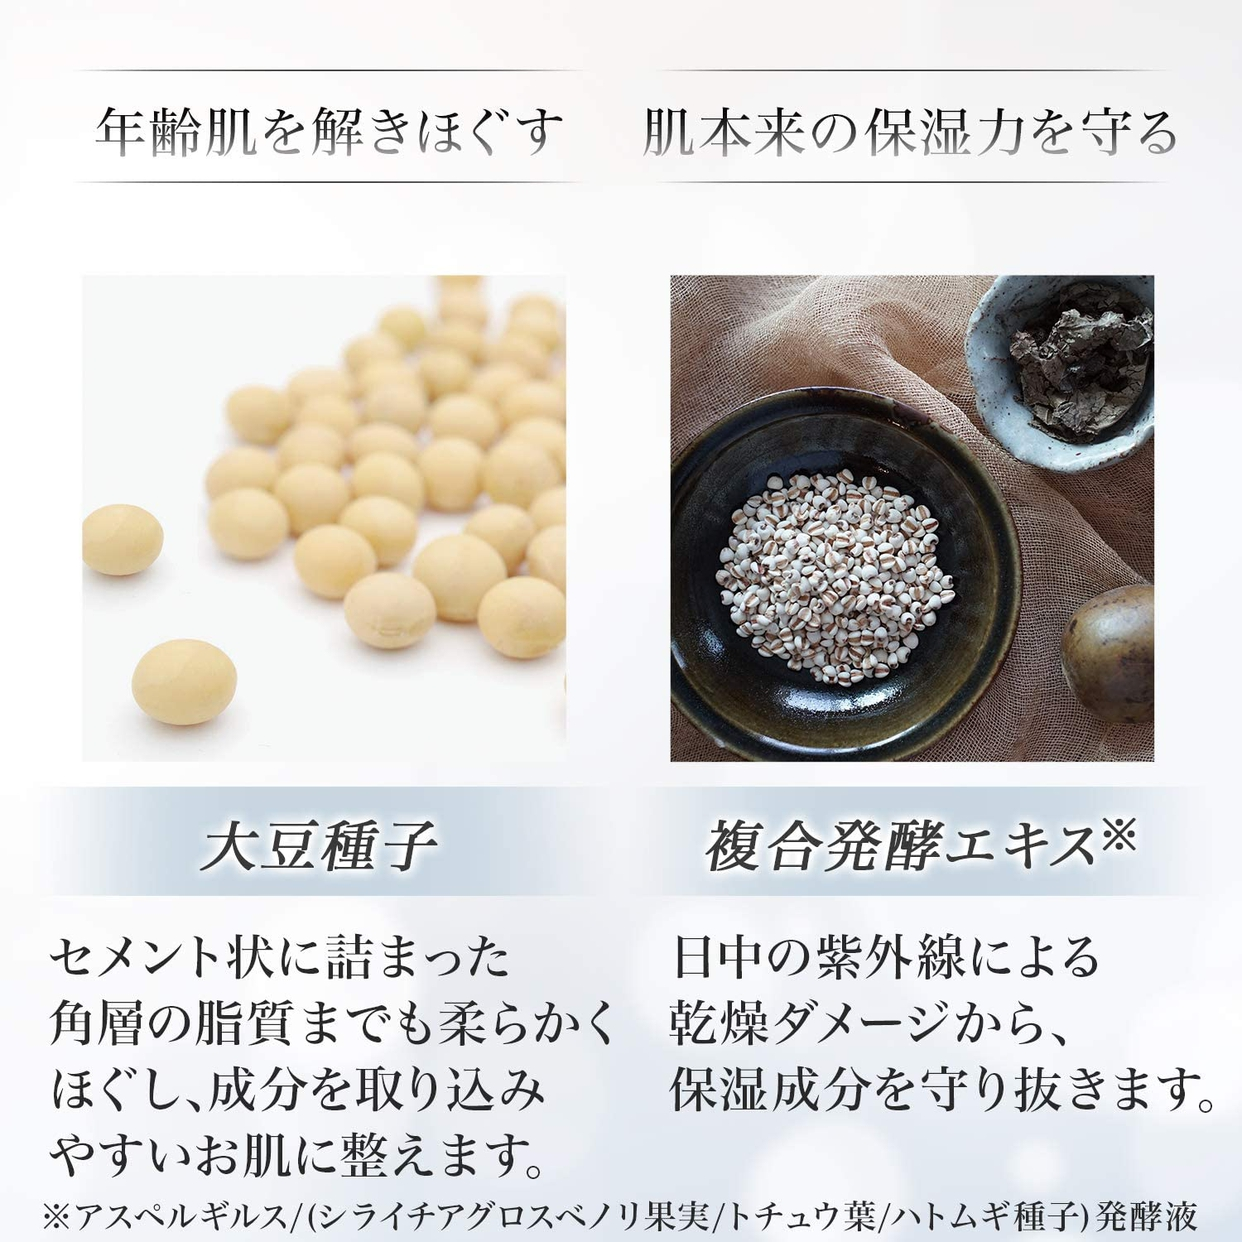 Domohorn Wrinkle(ドモホルンリンクル) 保湿液の商品画像5